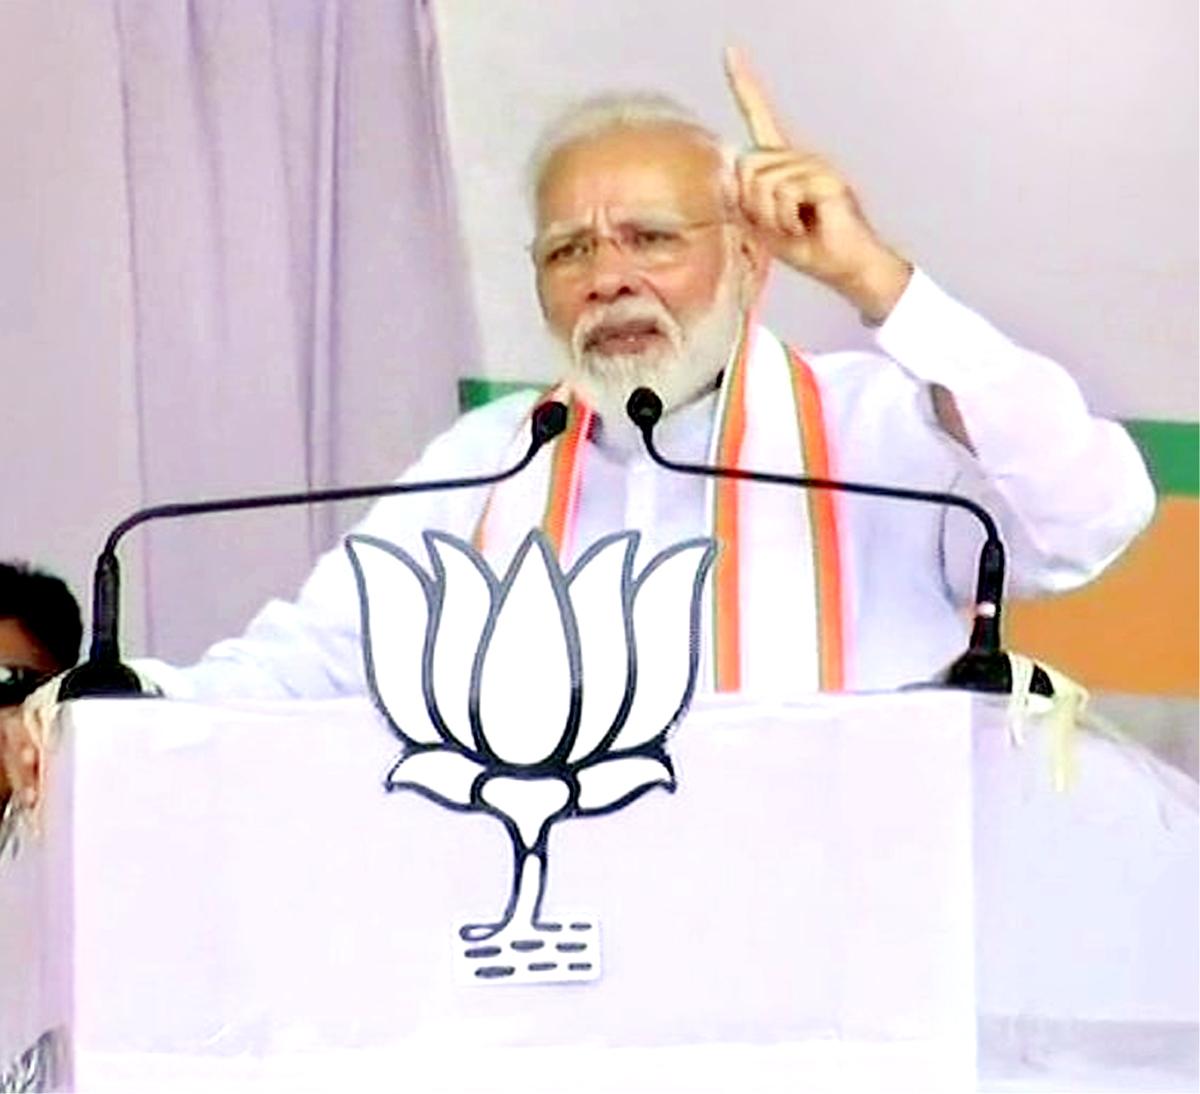 Prime Minister Narendra Modi addressing an election rally at Jalgaon in Maharashtra on Sunday.